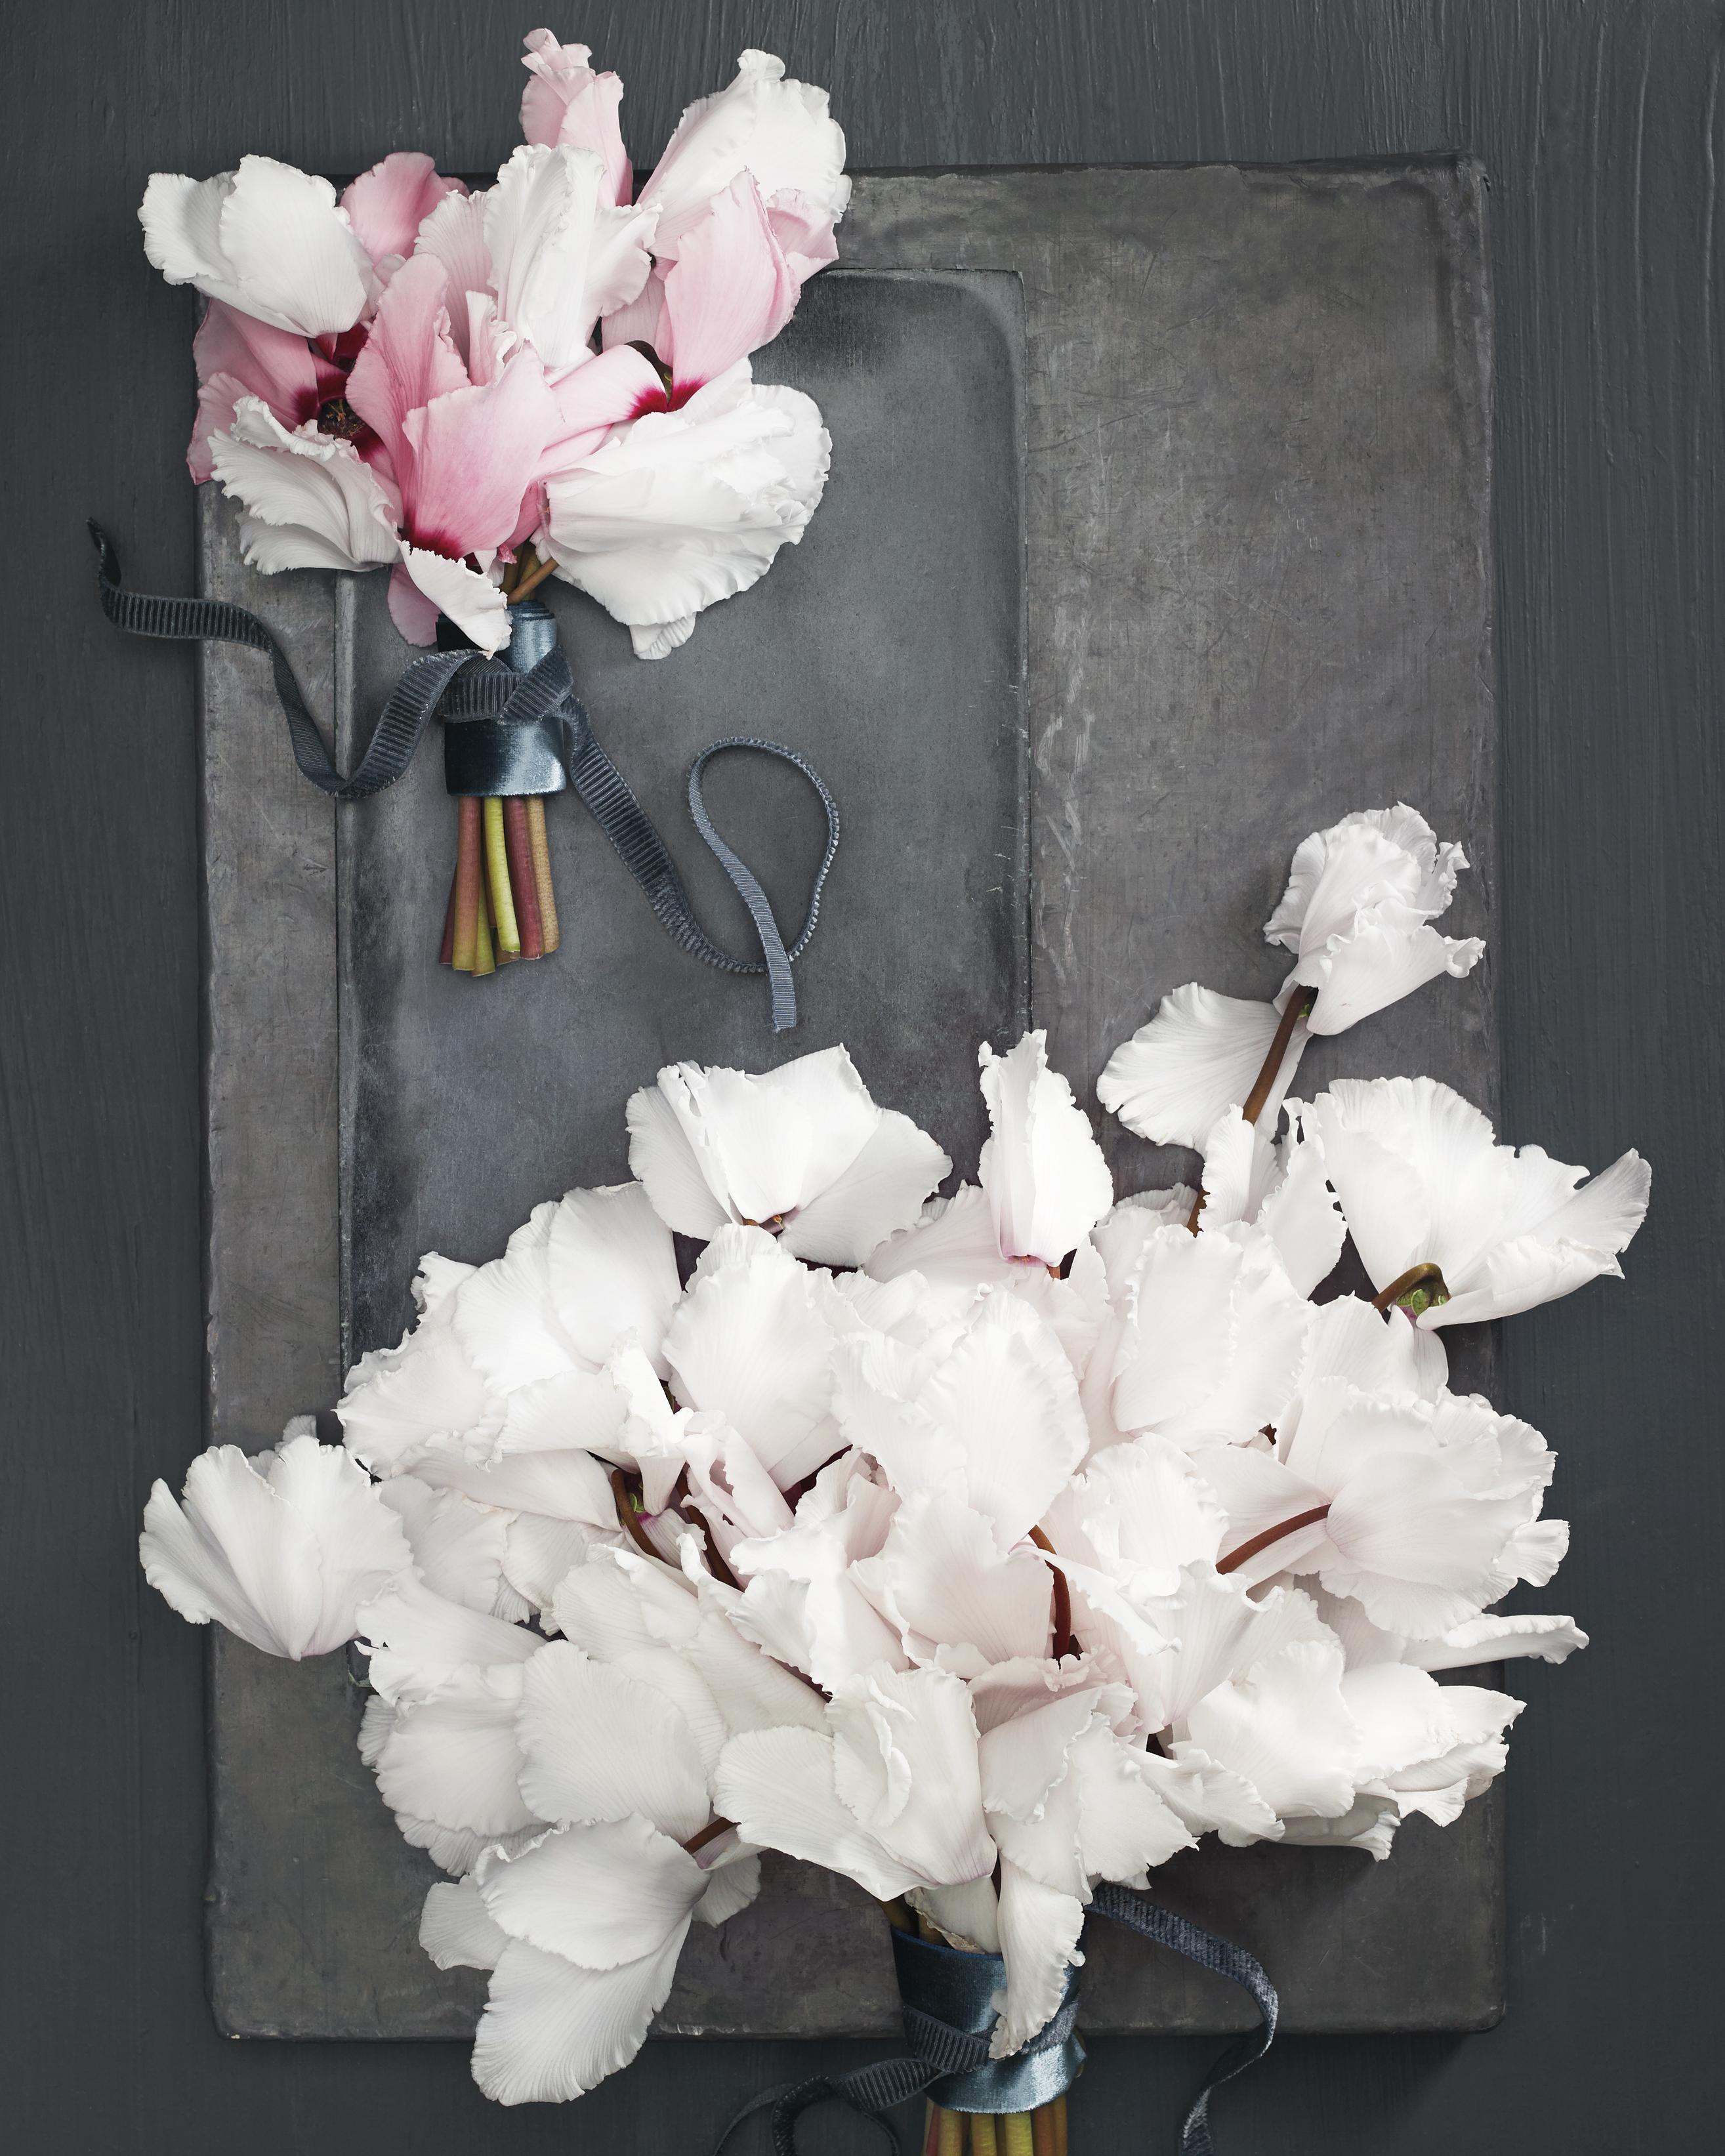 winter-1-bouquet-flowers-45484-2-d111785.jpg